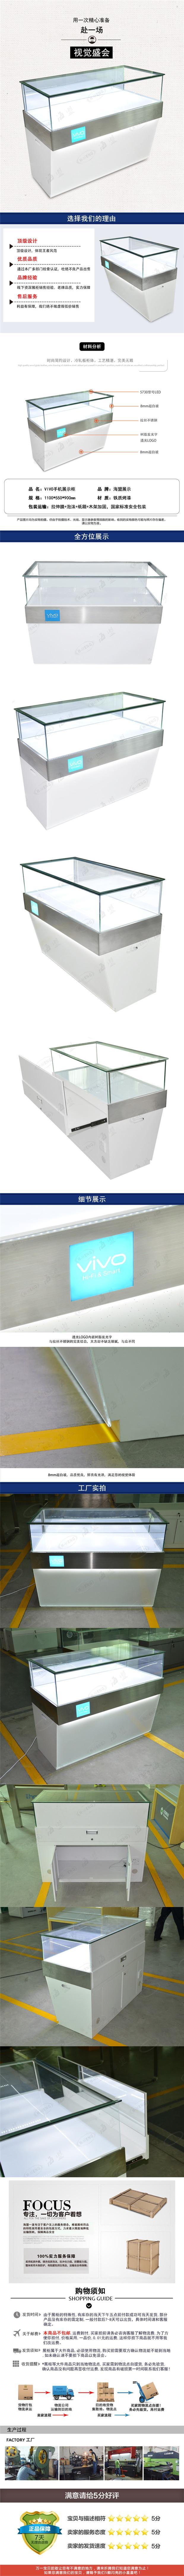 VIVO手机柜台手机体验台步步高展示柜台玻璃柜体验柜收银台